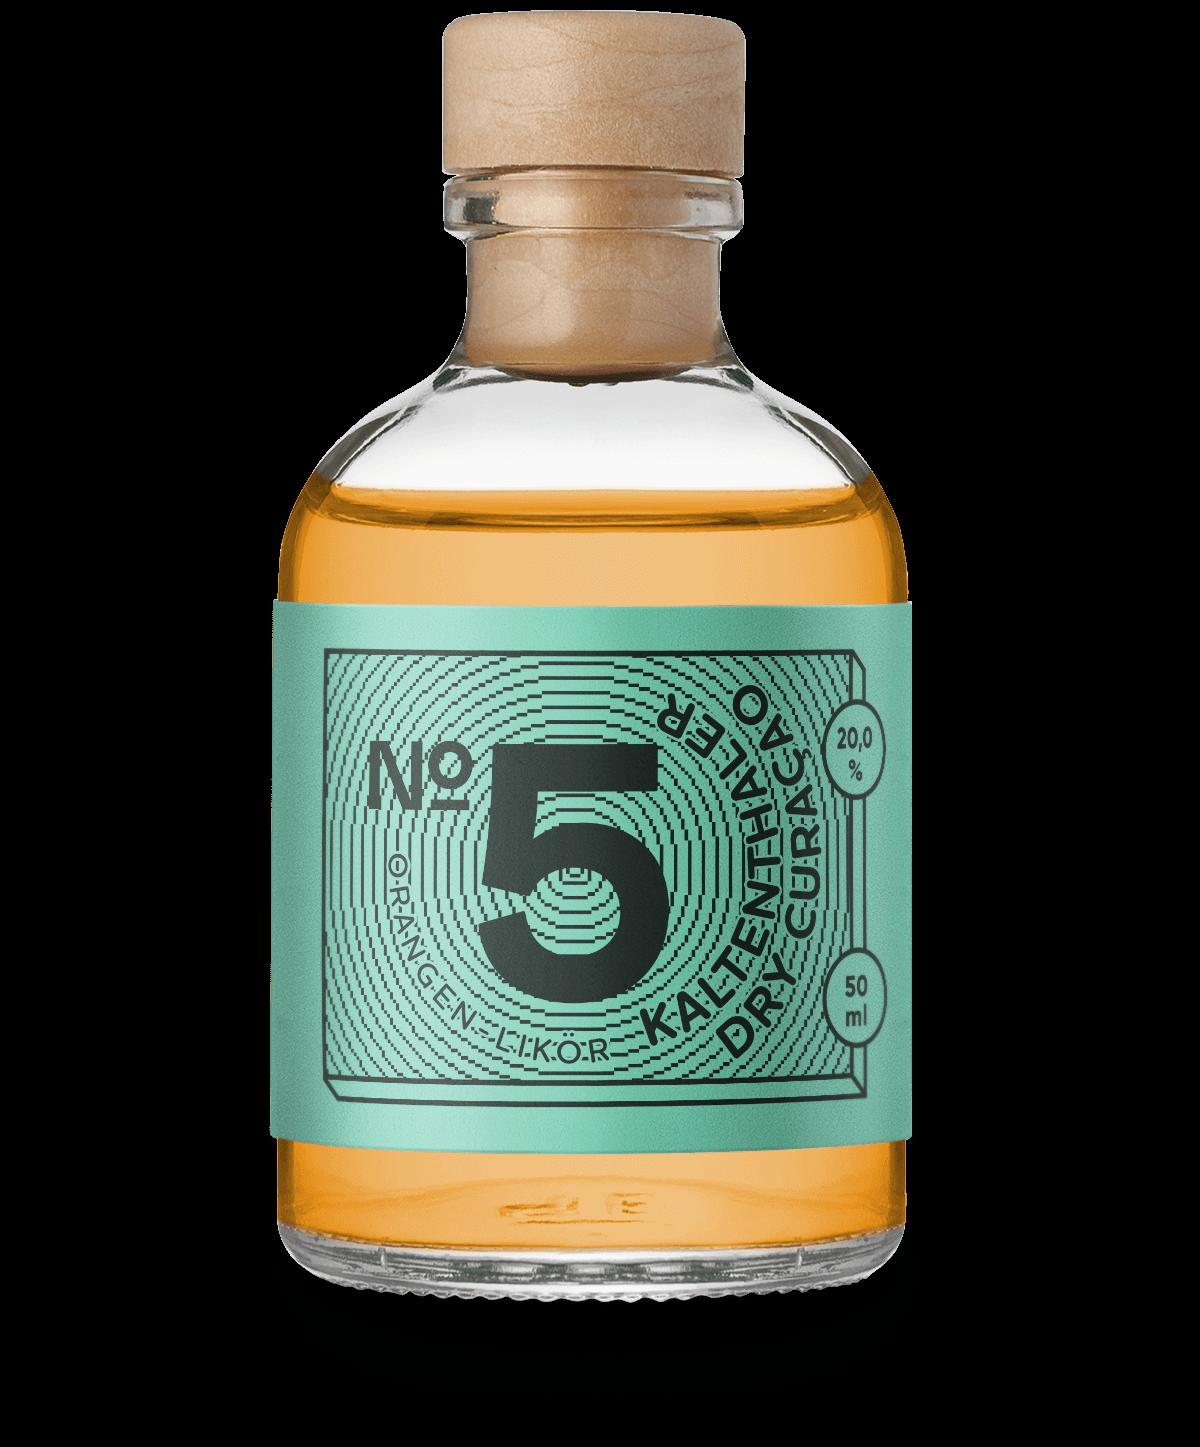 Revolte Dry Curacao, Zutat im Gin Tasting Set